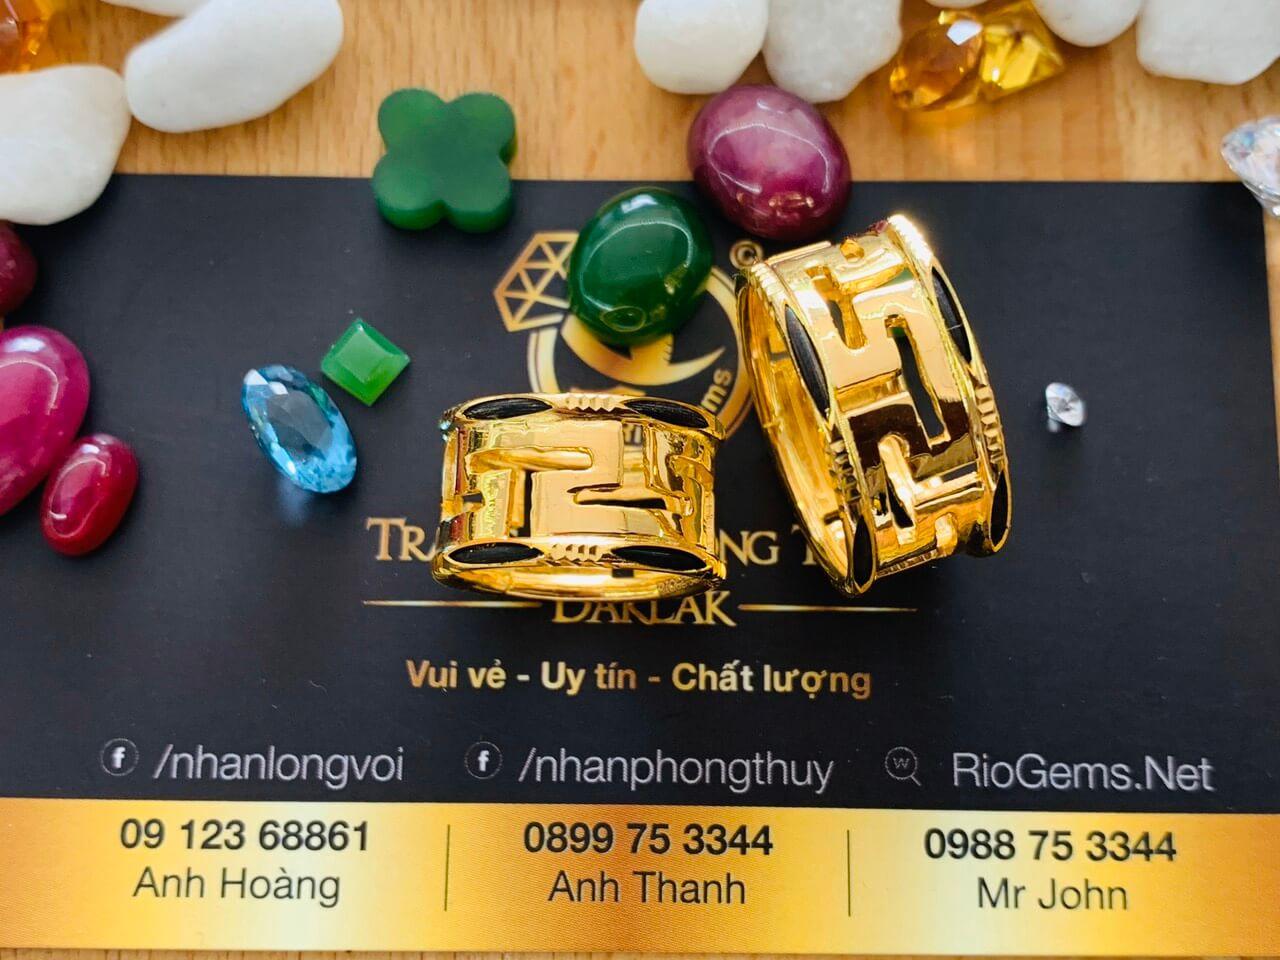 cap nhan chu van phong thuy duc vang luong long voi cho nam